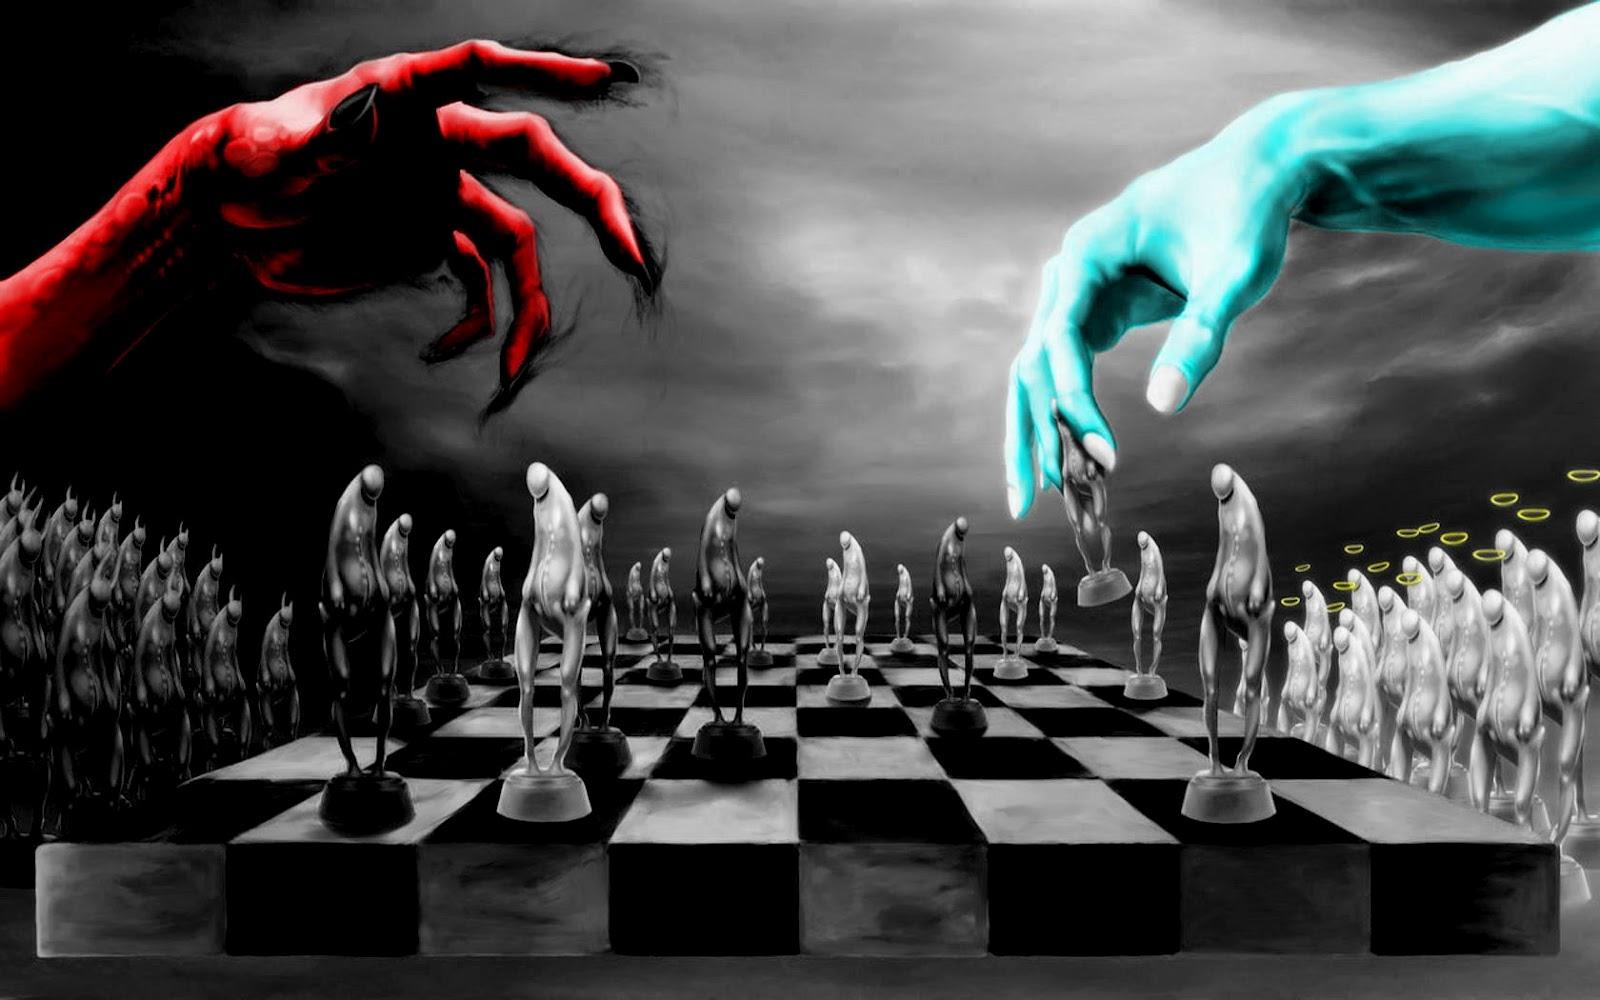 4K Chess Pics. 4K Chess Wallpaper 1080p